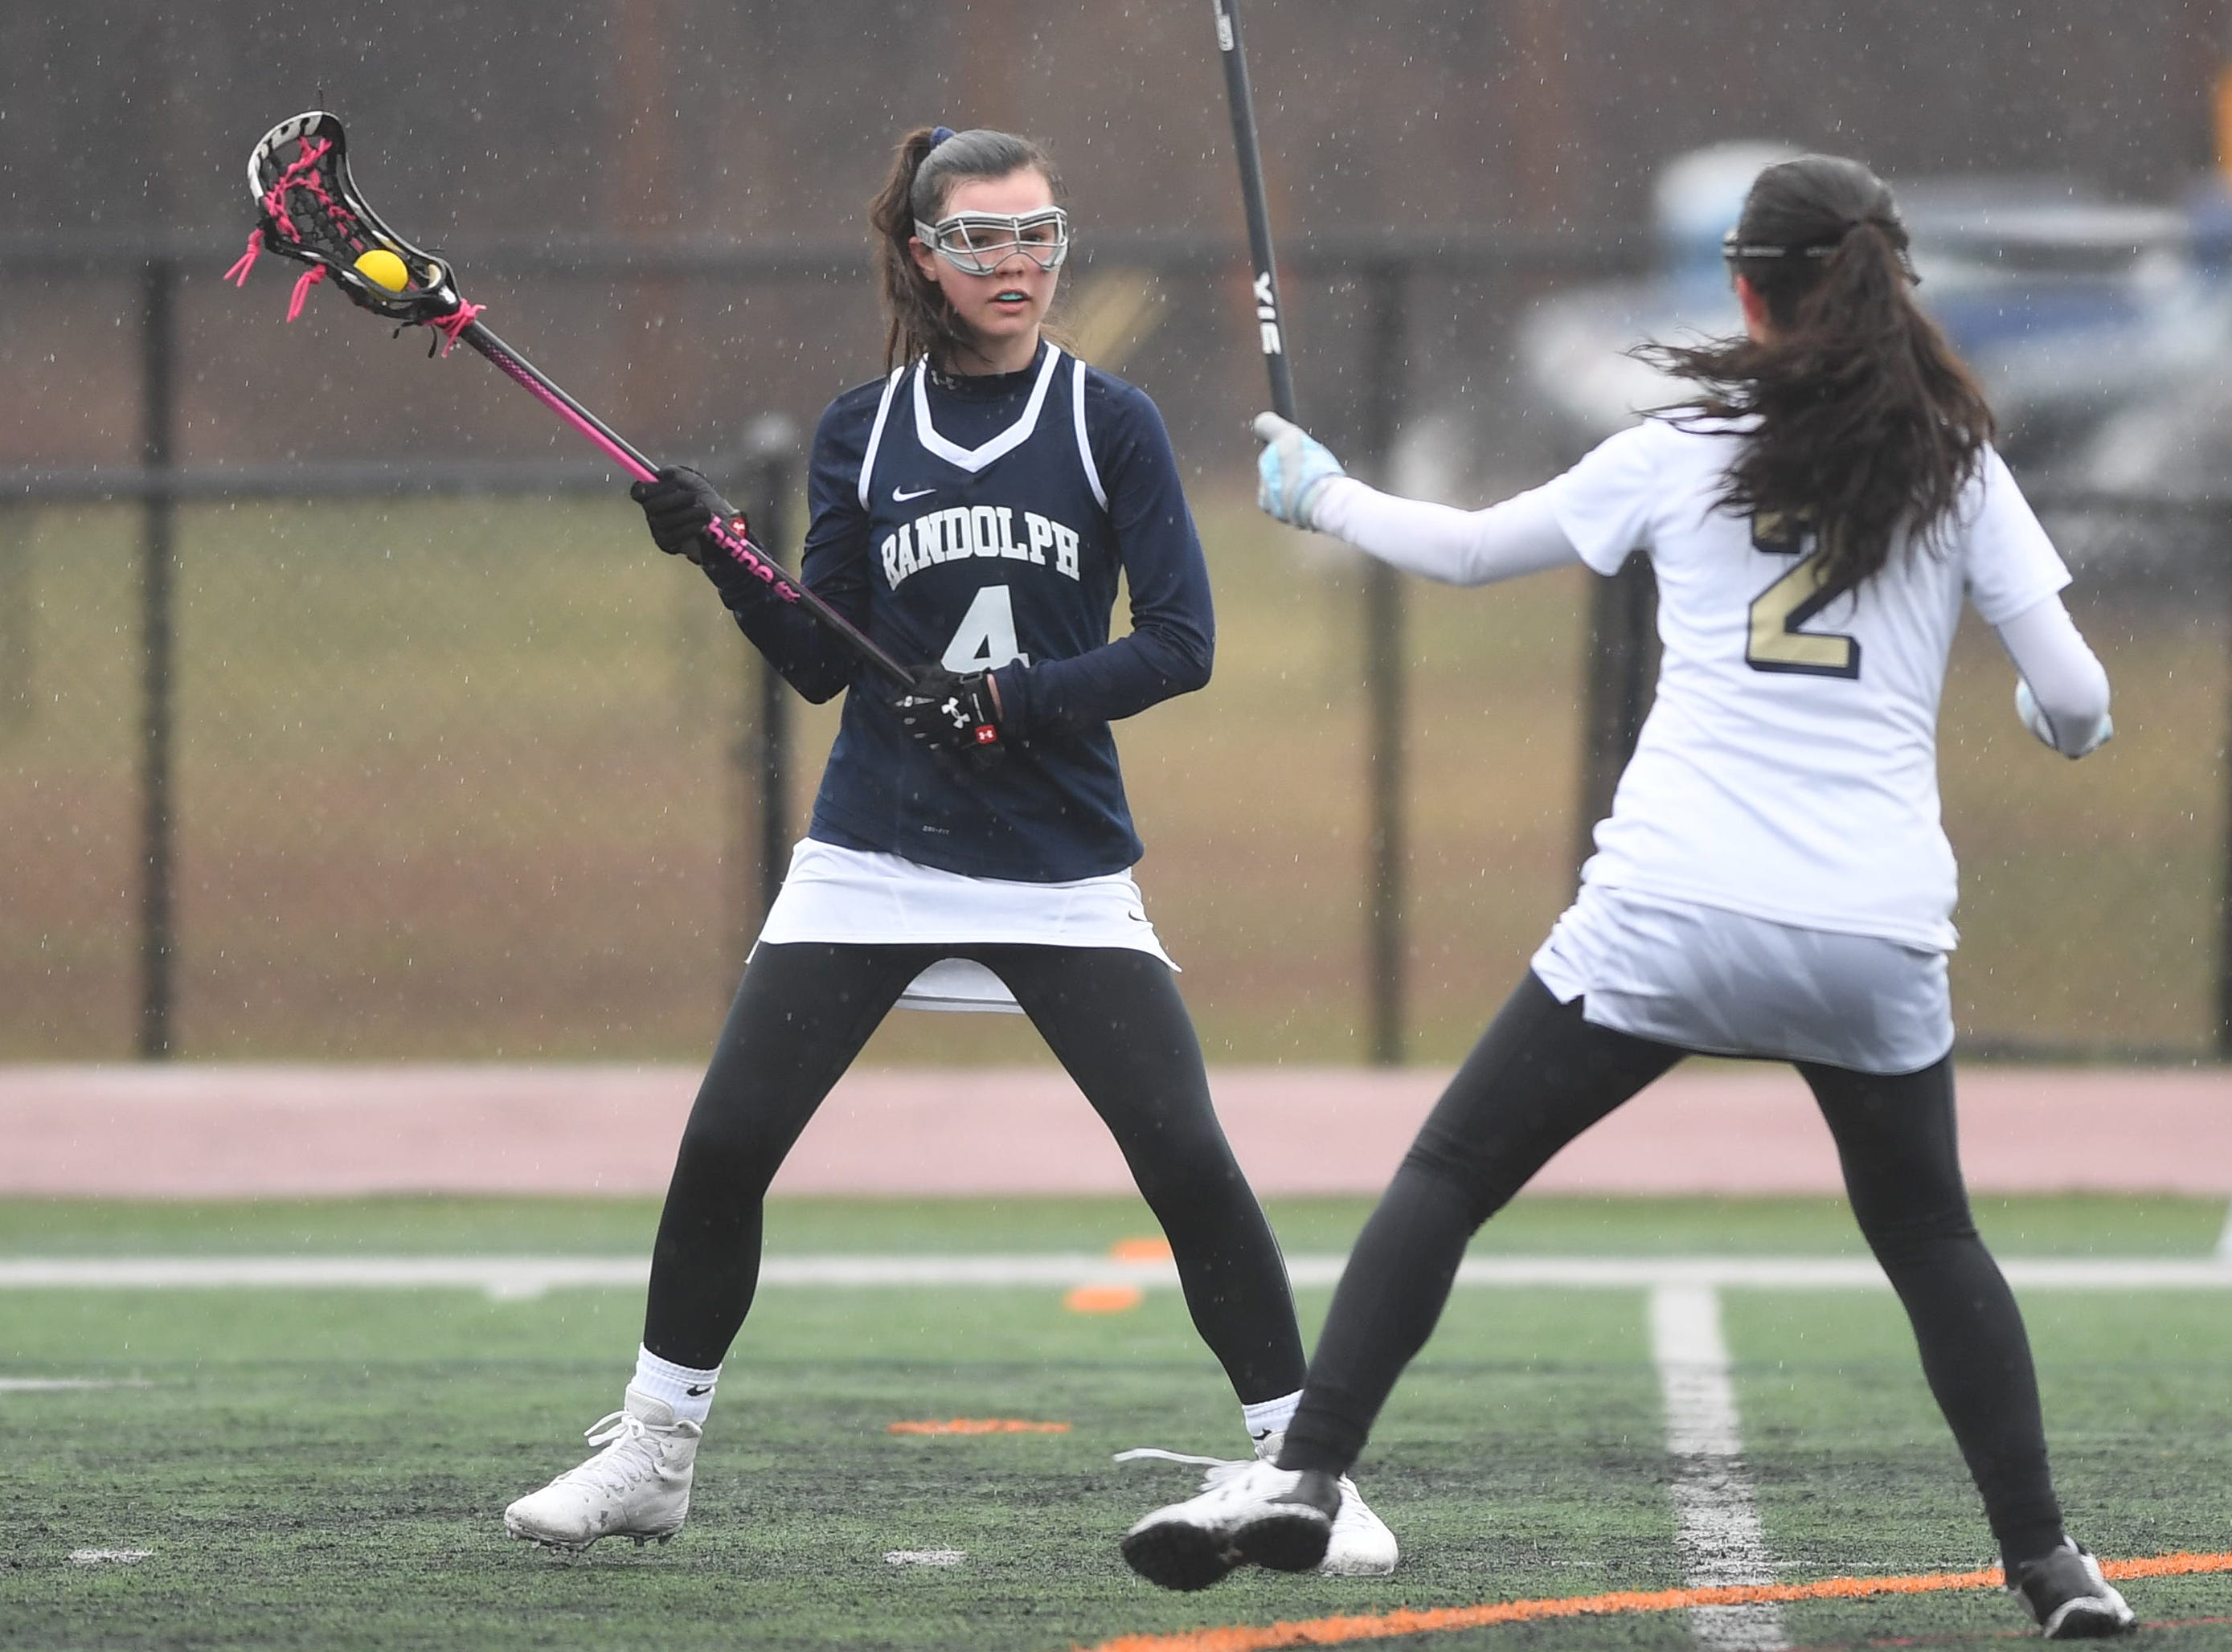 Randolph girls lacrosse at Roxbury on Friday, April 5, 2019. Randolph #4 Abby McConvery.